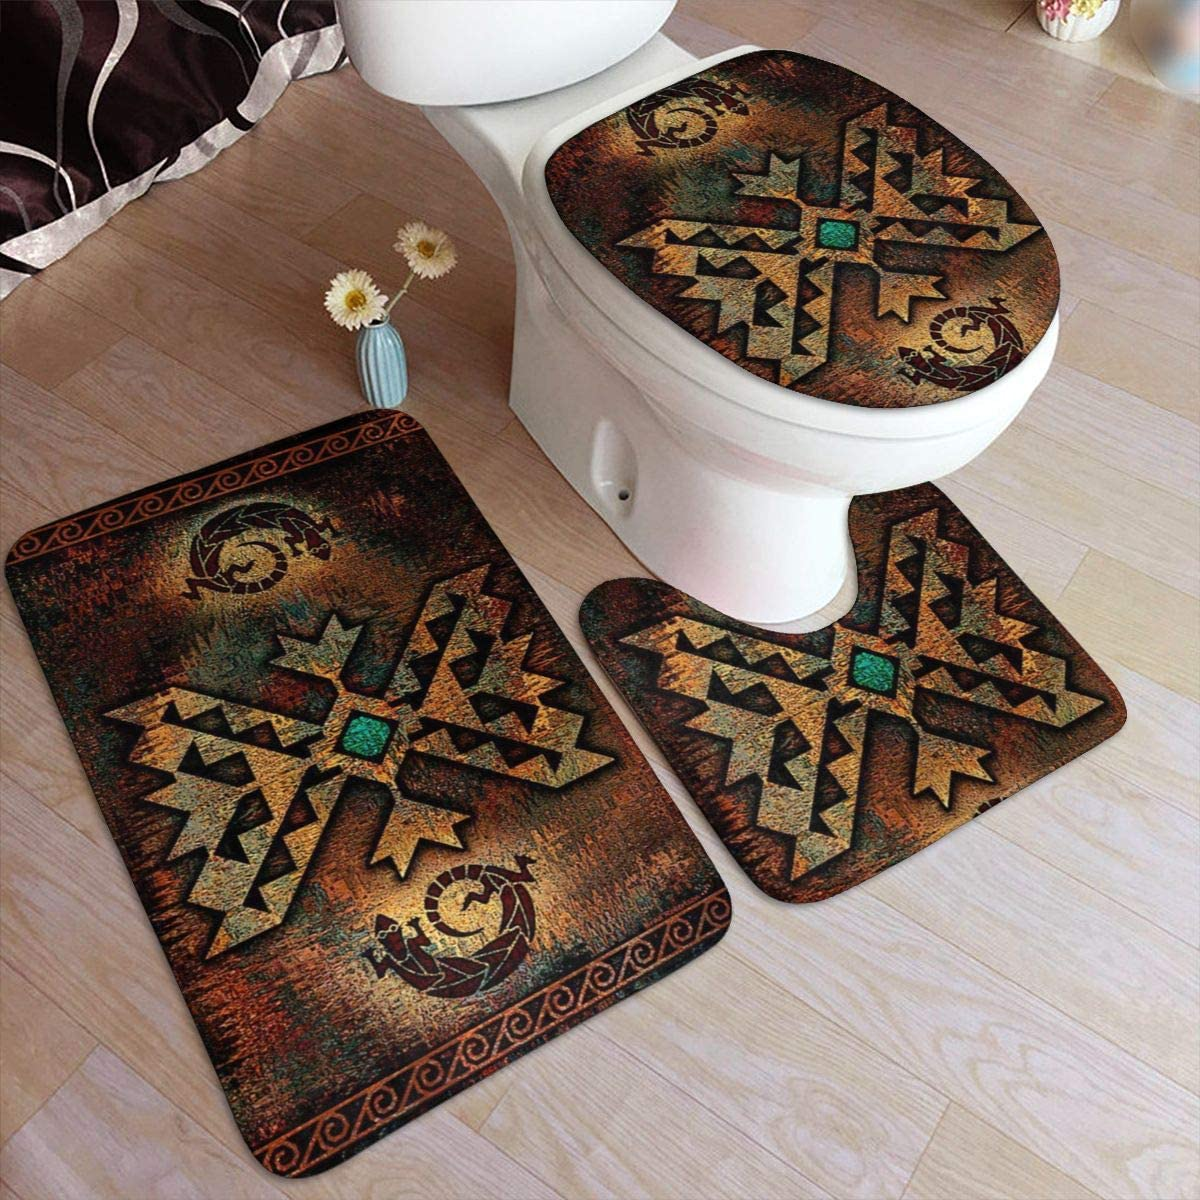 Vbcdgfg Bathroom Rugs Sets 5 Piece Native American Vintage Indian Lizard  Bathroom Rugs Mats Set 5 Pieces Bath Rugs for Bathroom Washable U-Shaped